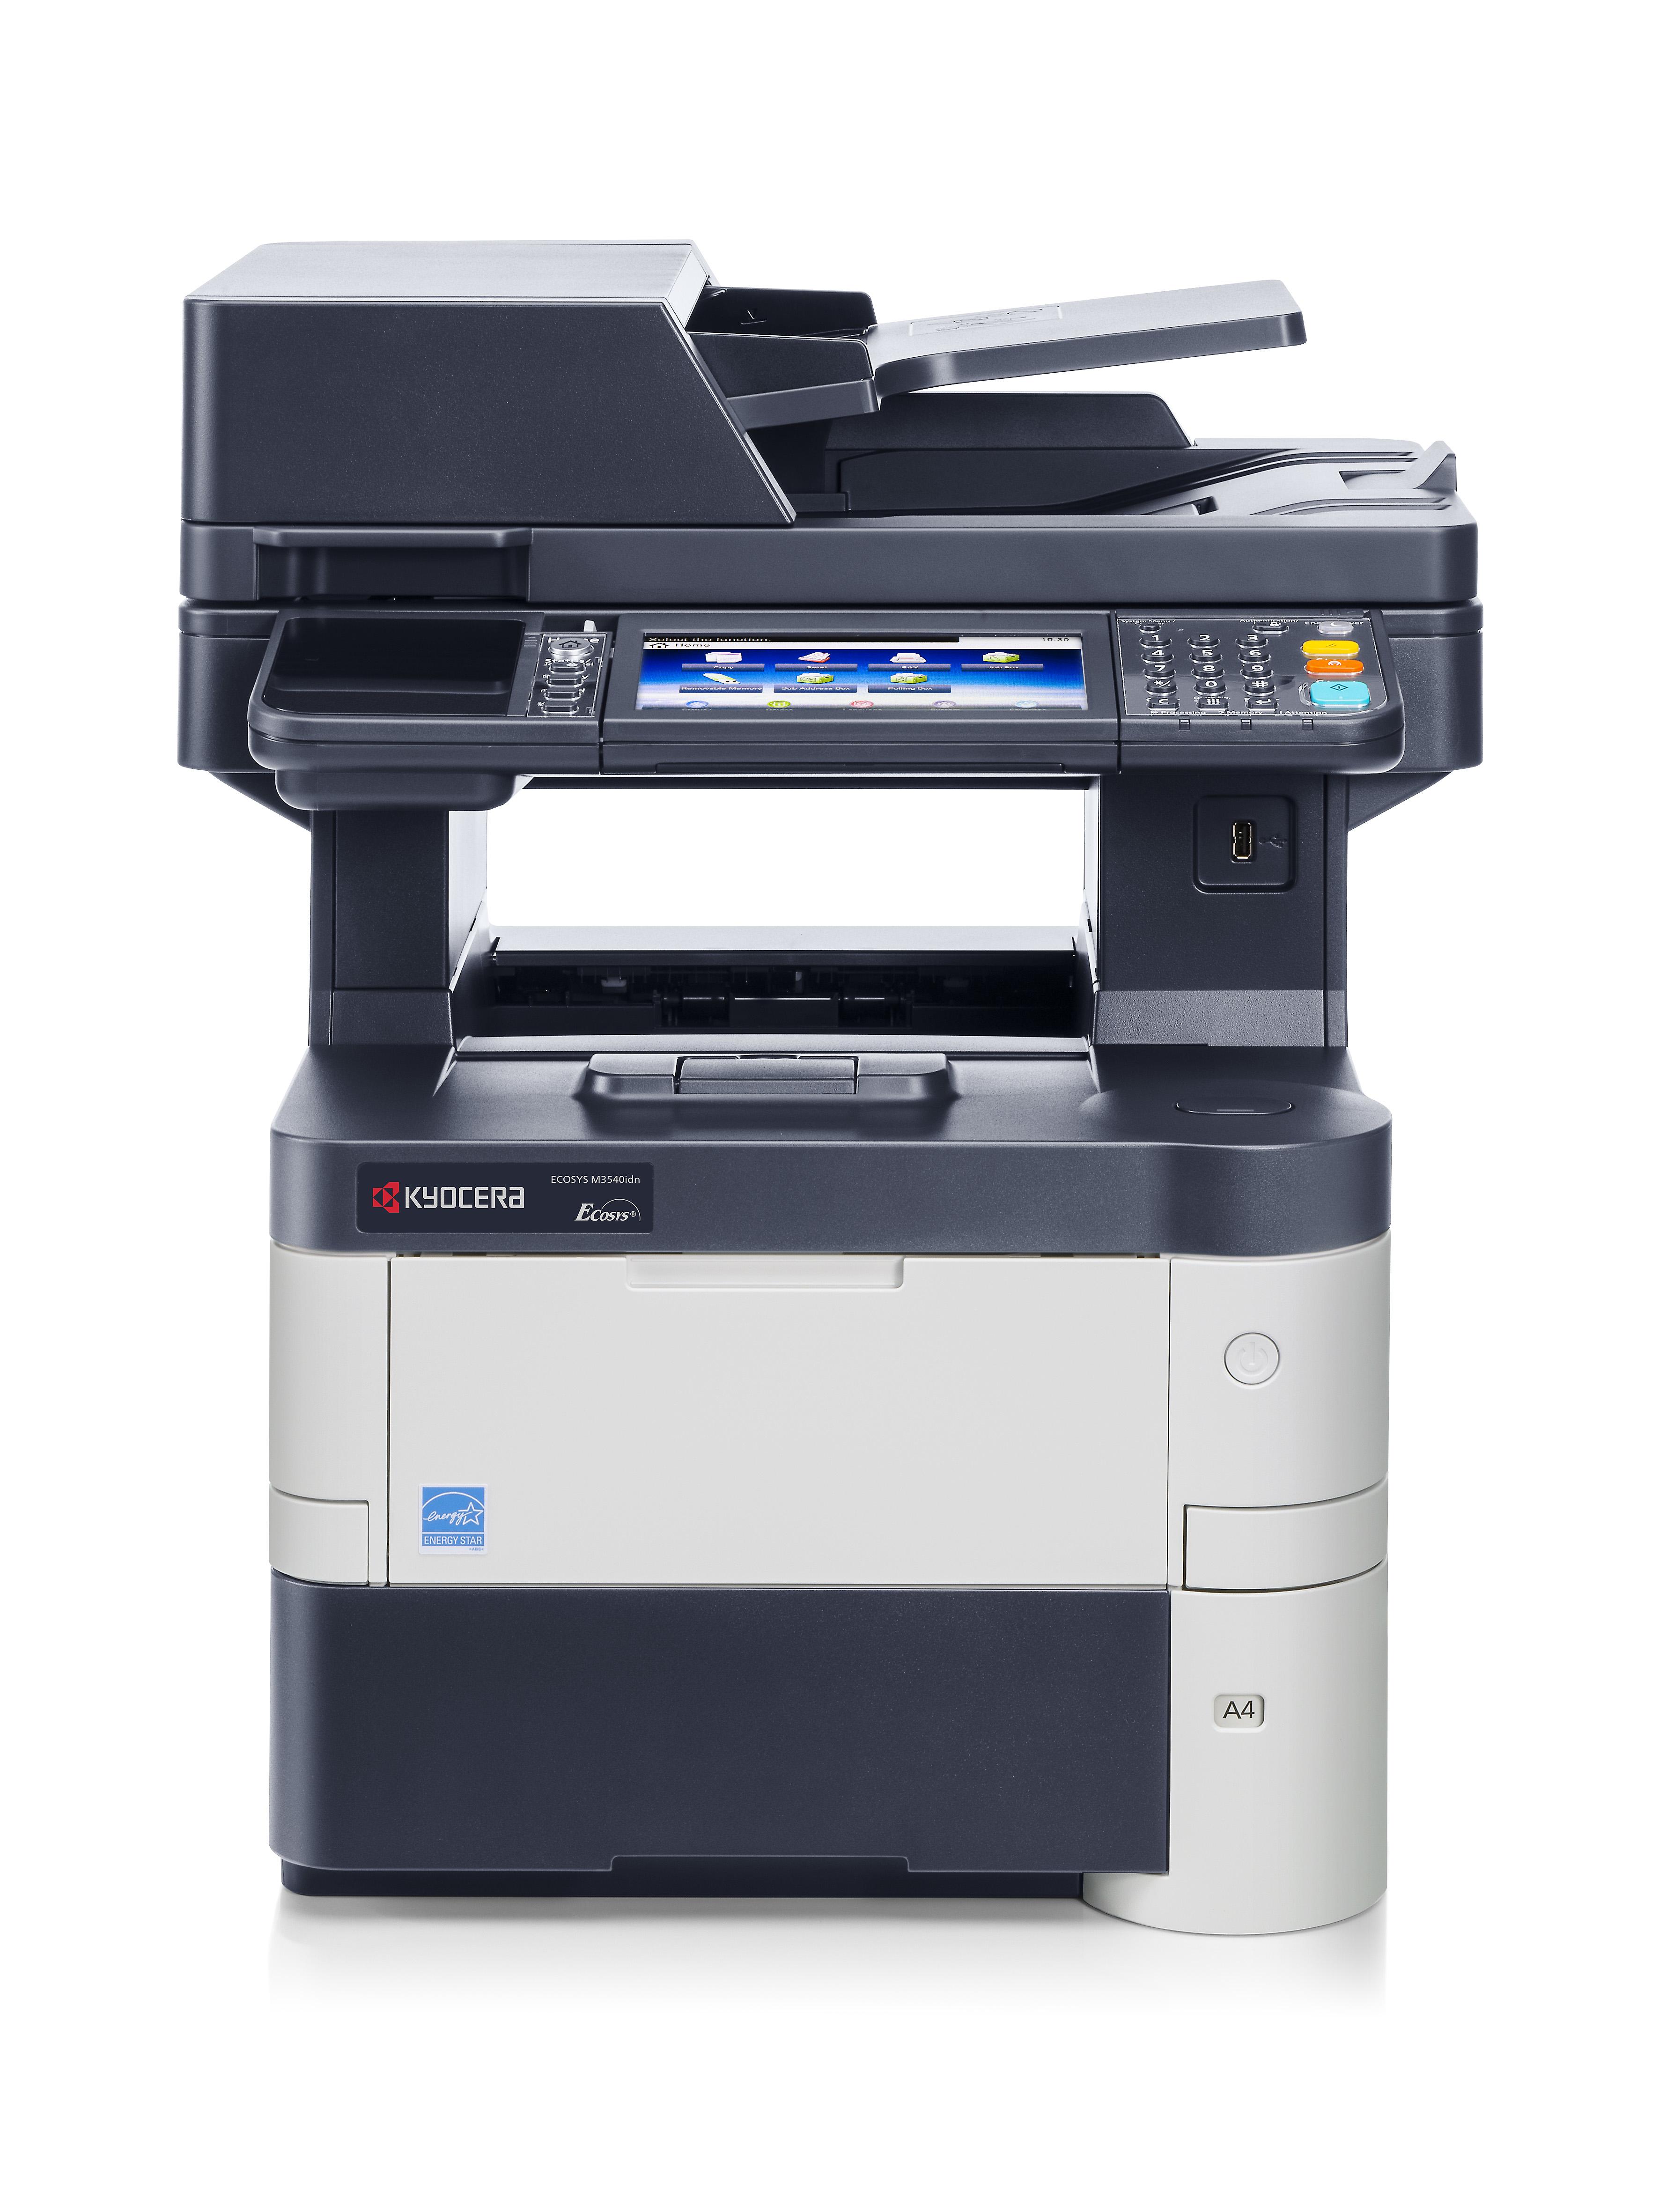 Kyocera ECOSYS M3040idn - Multifunktionsdrucker - s/w